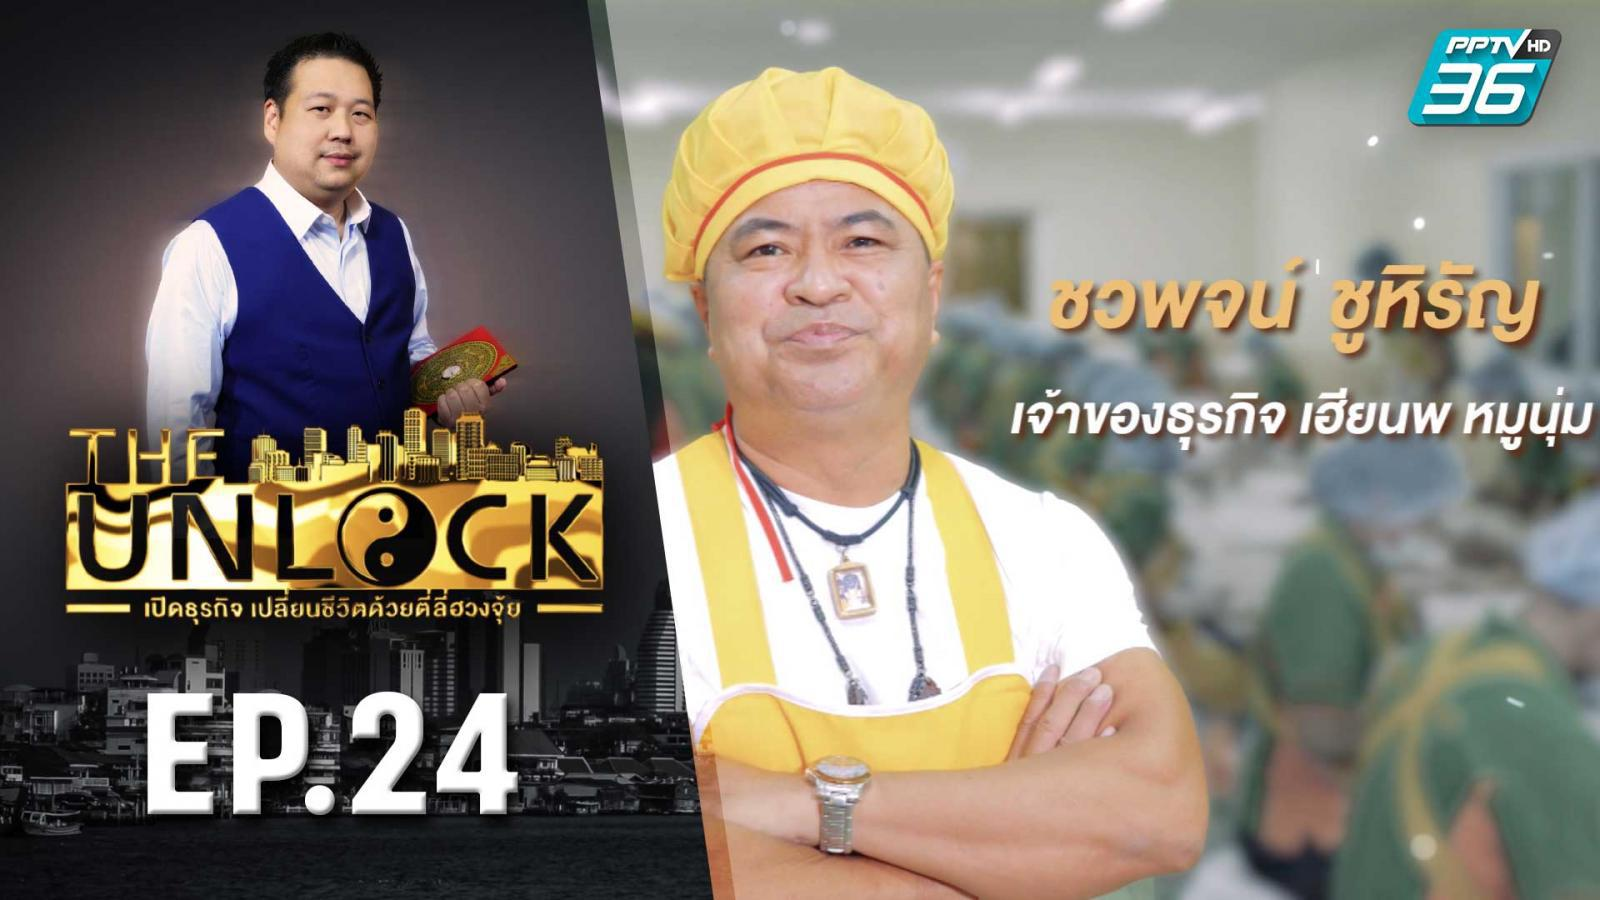 The Unlock เปิดธุรกิจ เปลี่ยนชีวิตด้วยตี่ลี่ฮวงจุ้ย | โรงงานหมูนุ่มเฮียนพ 200 ล้าน EP.24 | PPTVHD 36